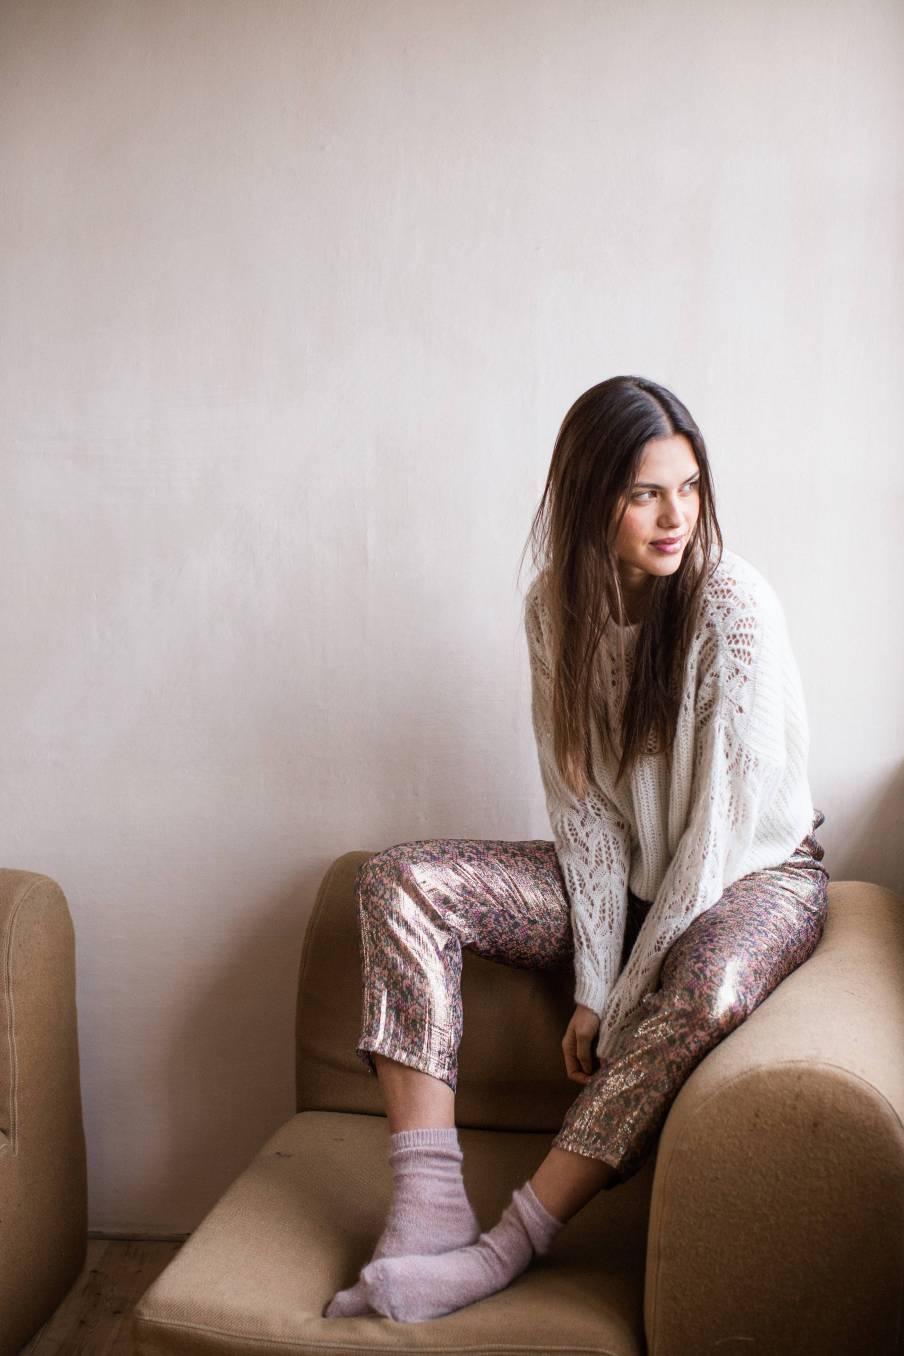 boheme chic vintage chaussettes femme piria blush